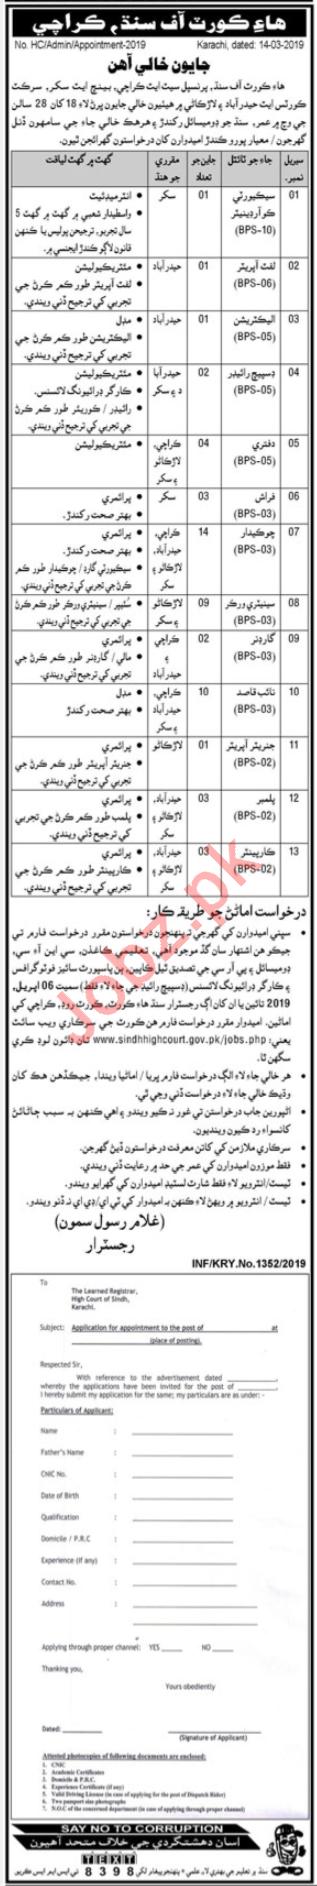 Sindh High Court Jobs in Karachi, Sukkur, Larkana, Hyderabad